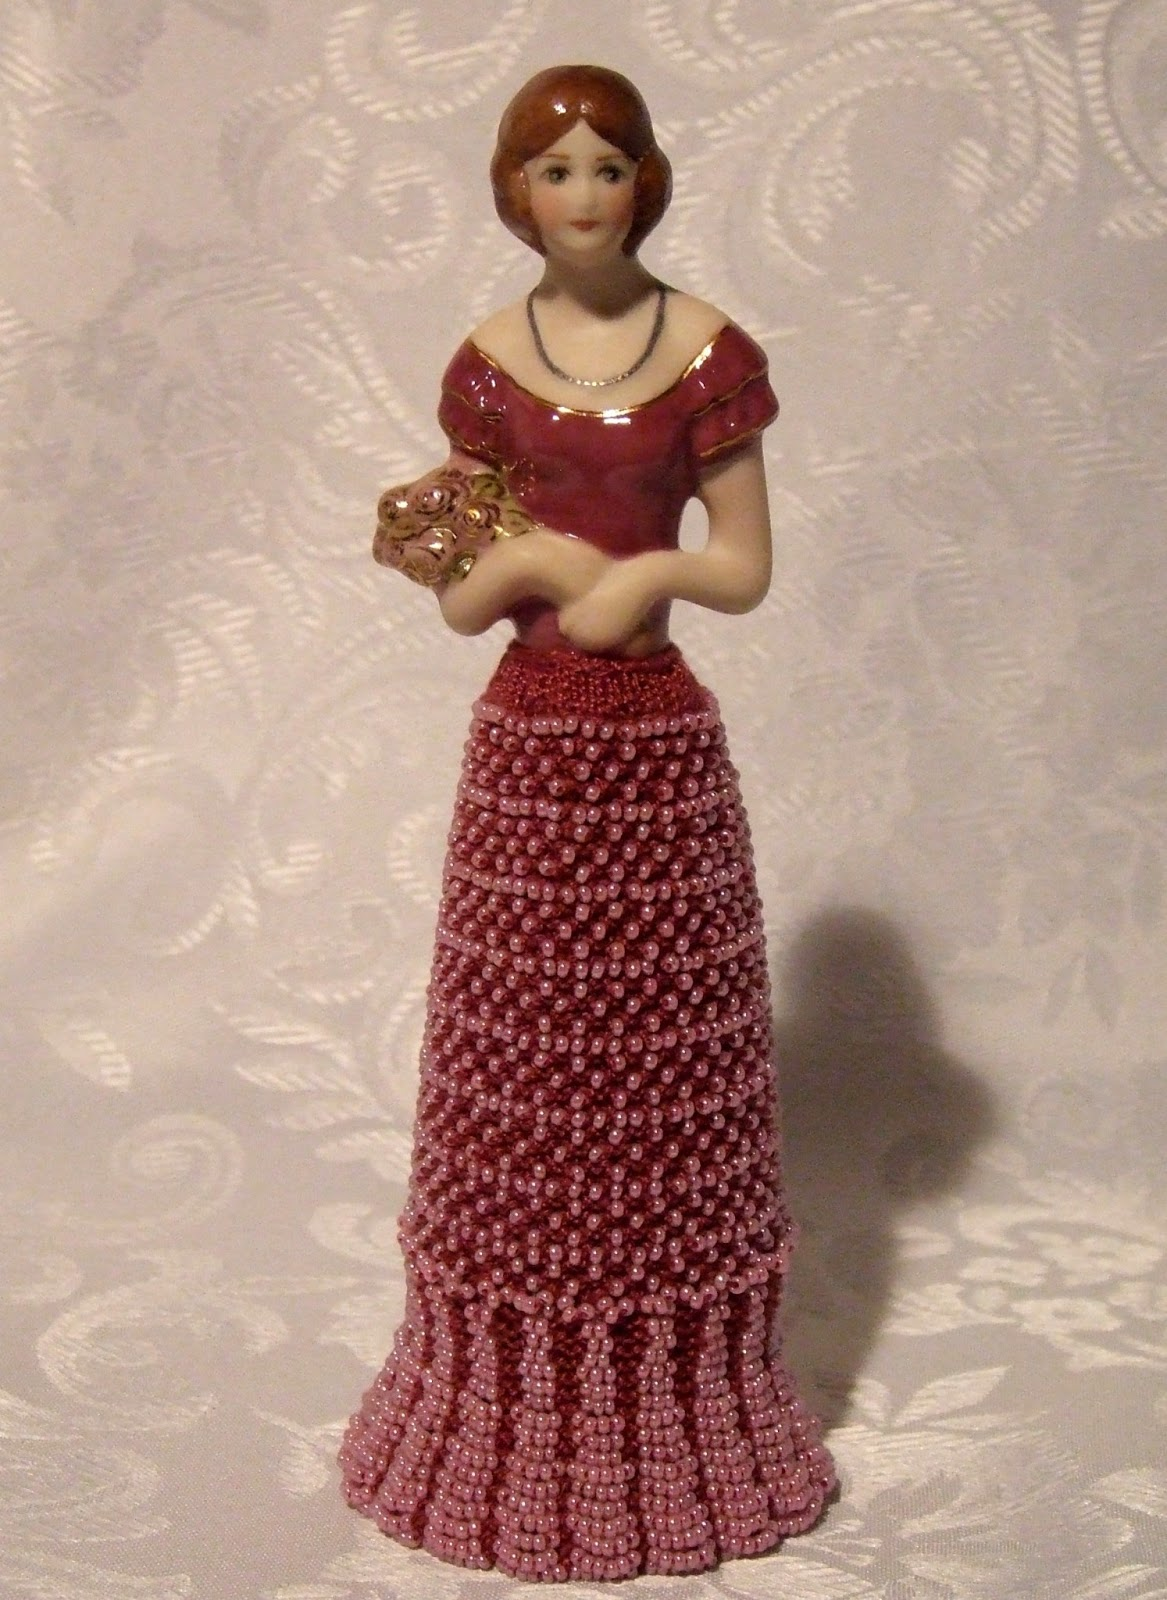 Beaded Knitting Patterns Half Dolls : Beading Belles: Half Doll Rebecca